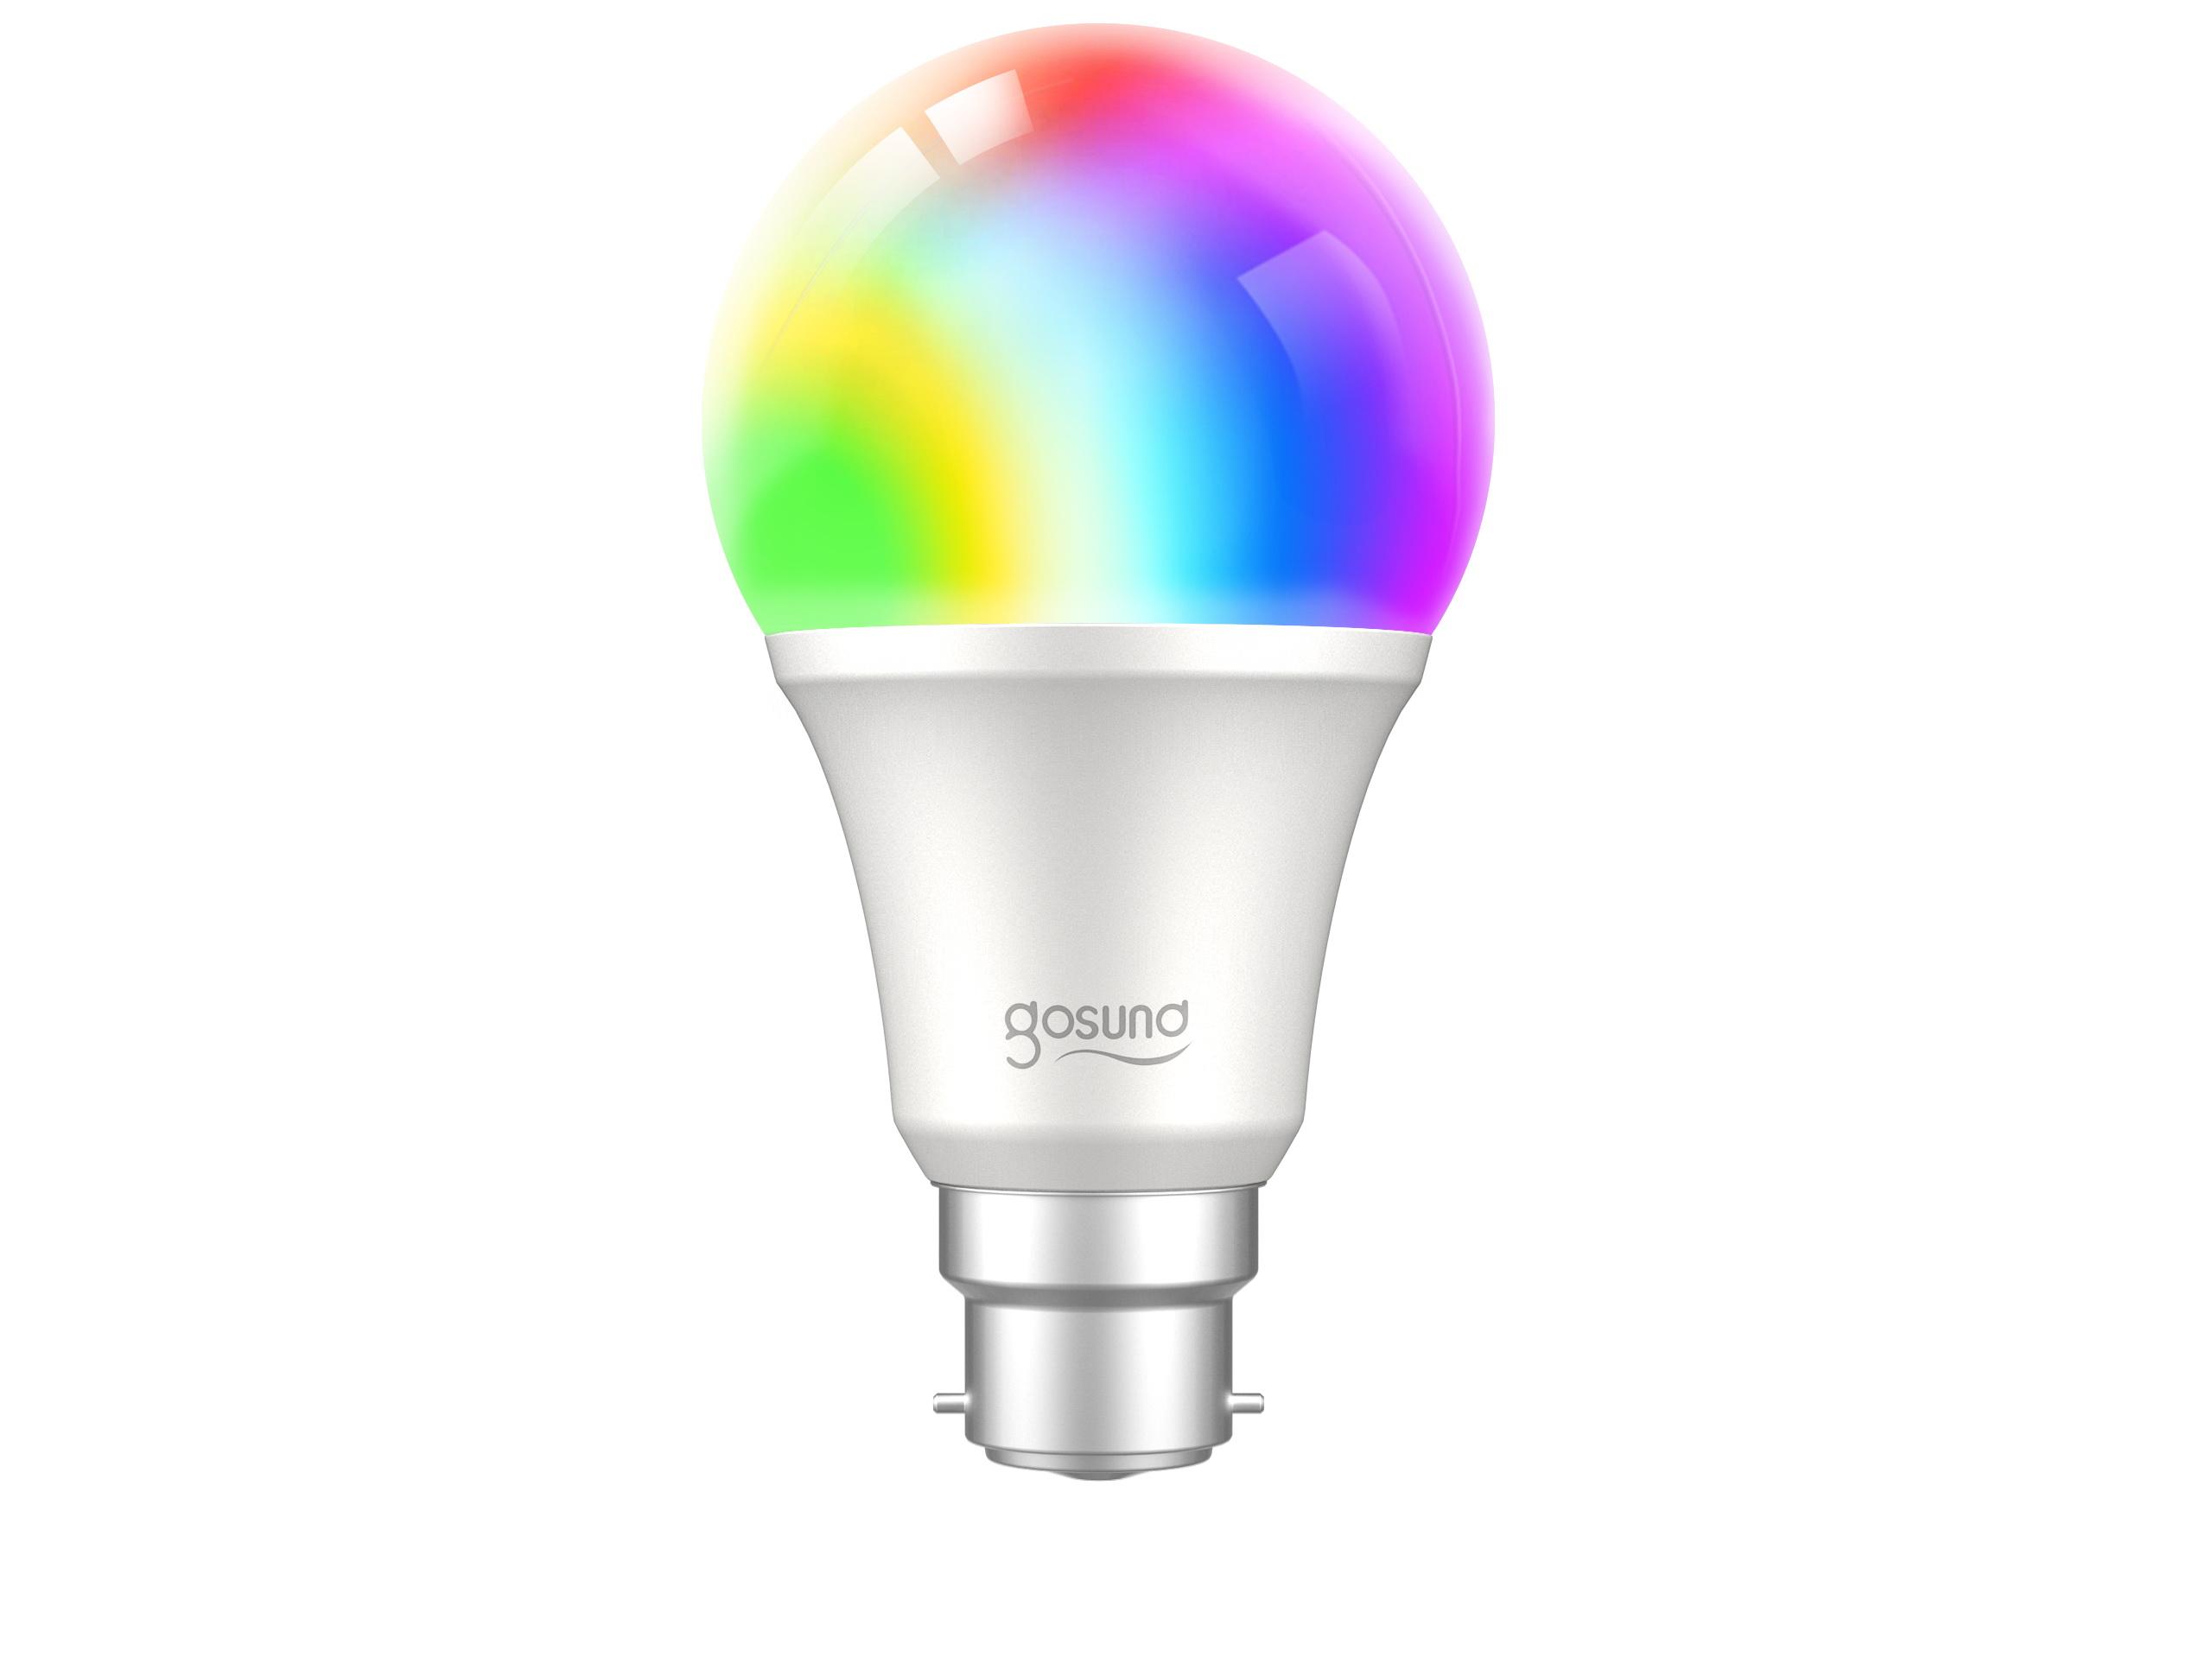 Gosund WB4 smart lamp 230V, 8W (75W eq.), 800lm, E27, RGB W dimbaar, Allexa, Google Home and IFTTT compatible